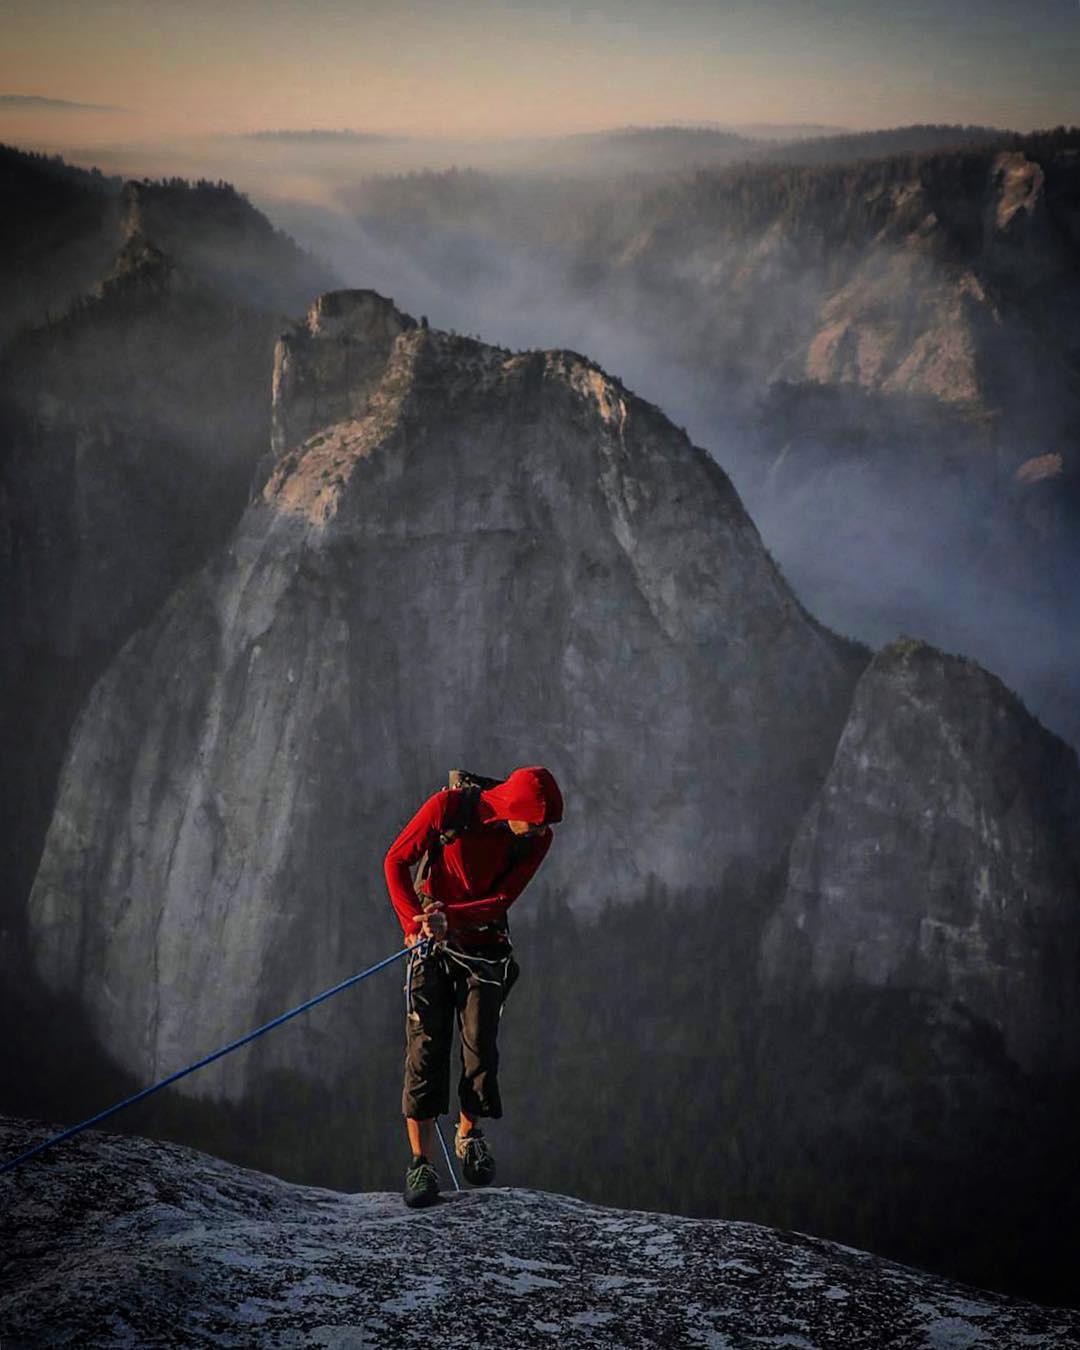 Abseil Yosemite alex honnold